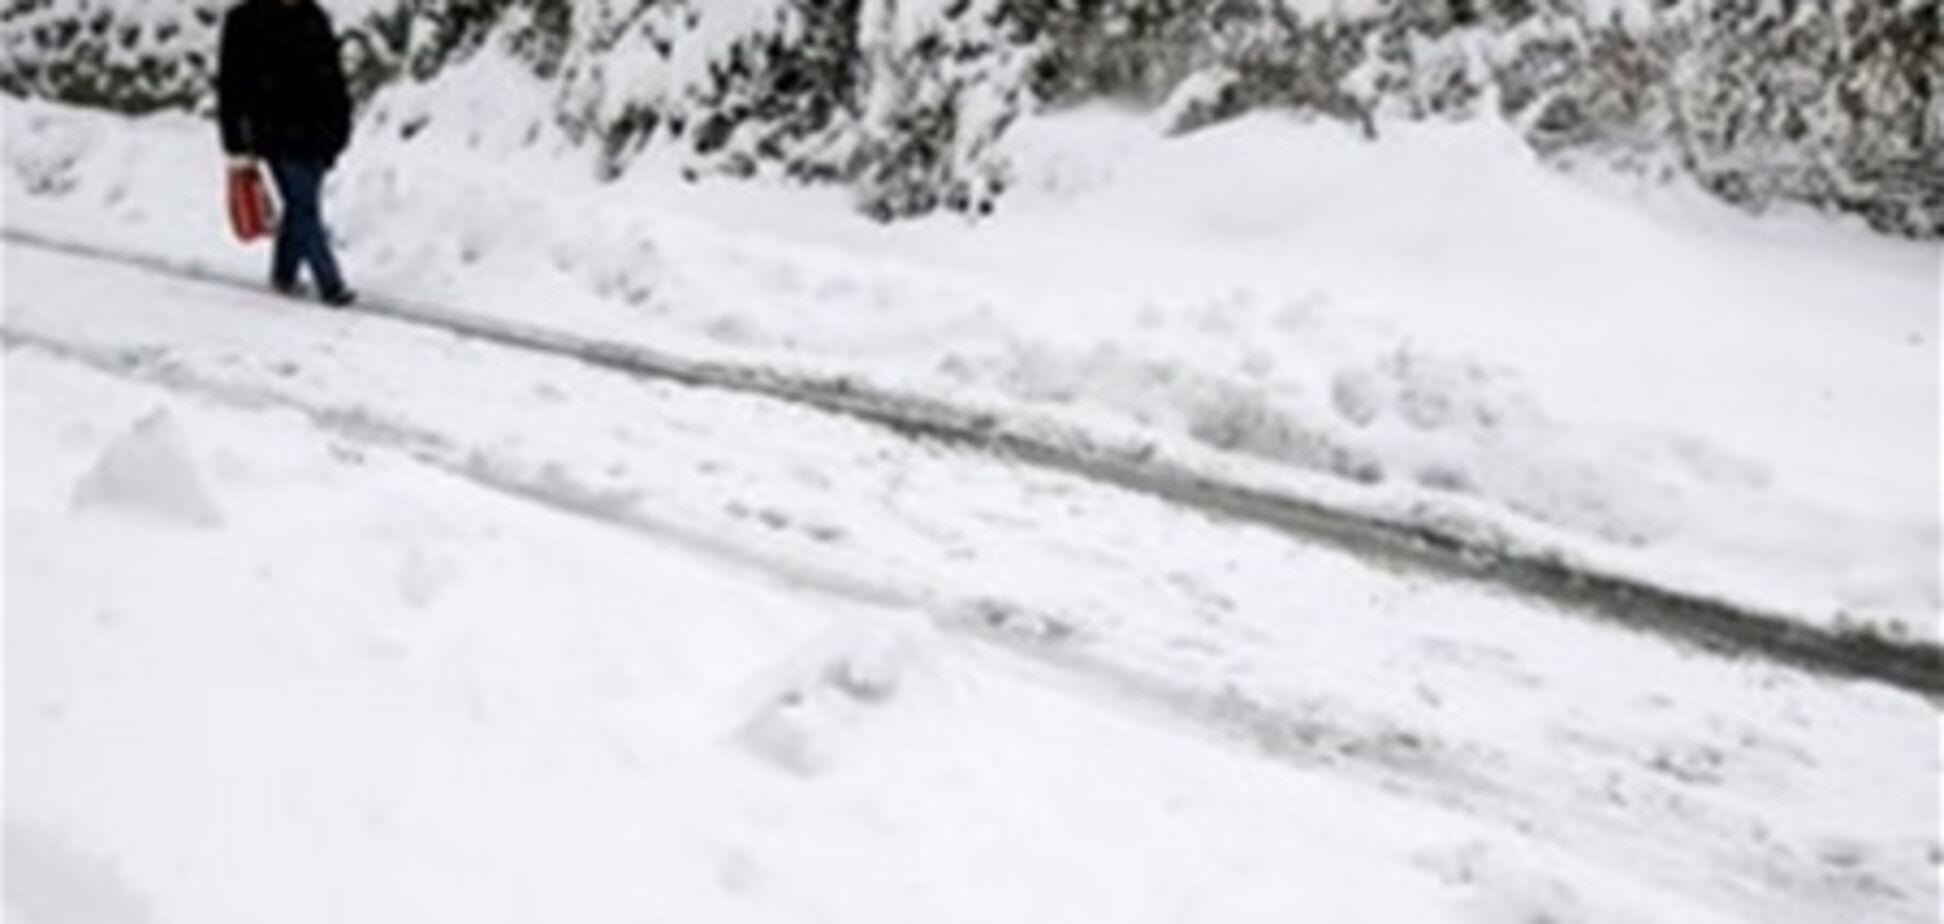 Через снігопади на Балканах загинули шестеро людей